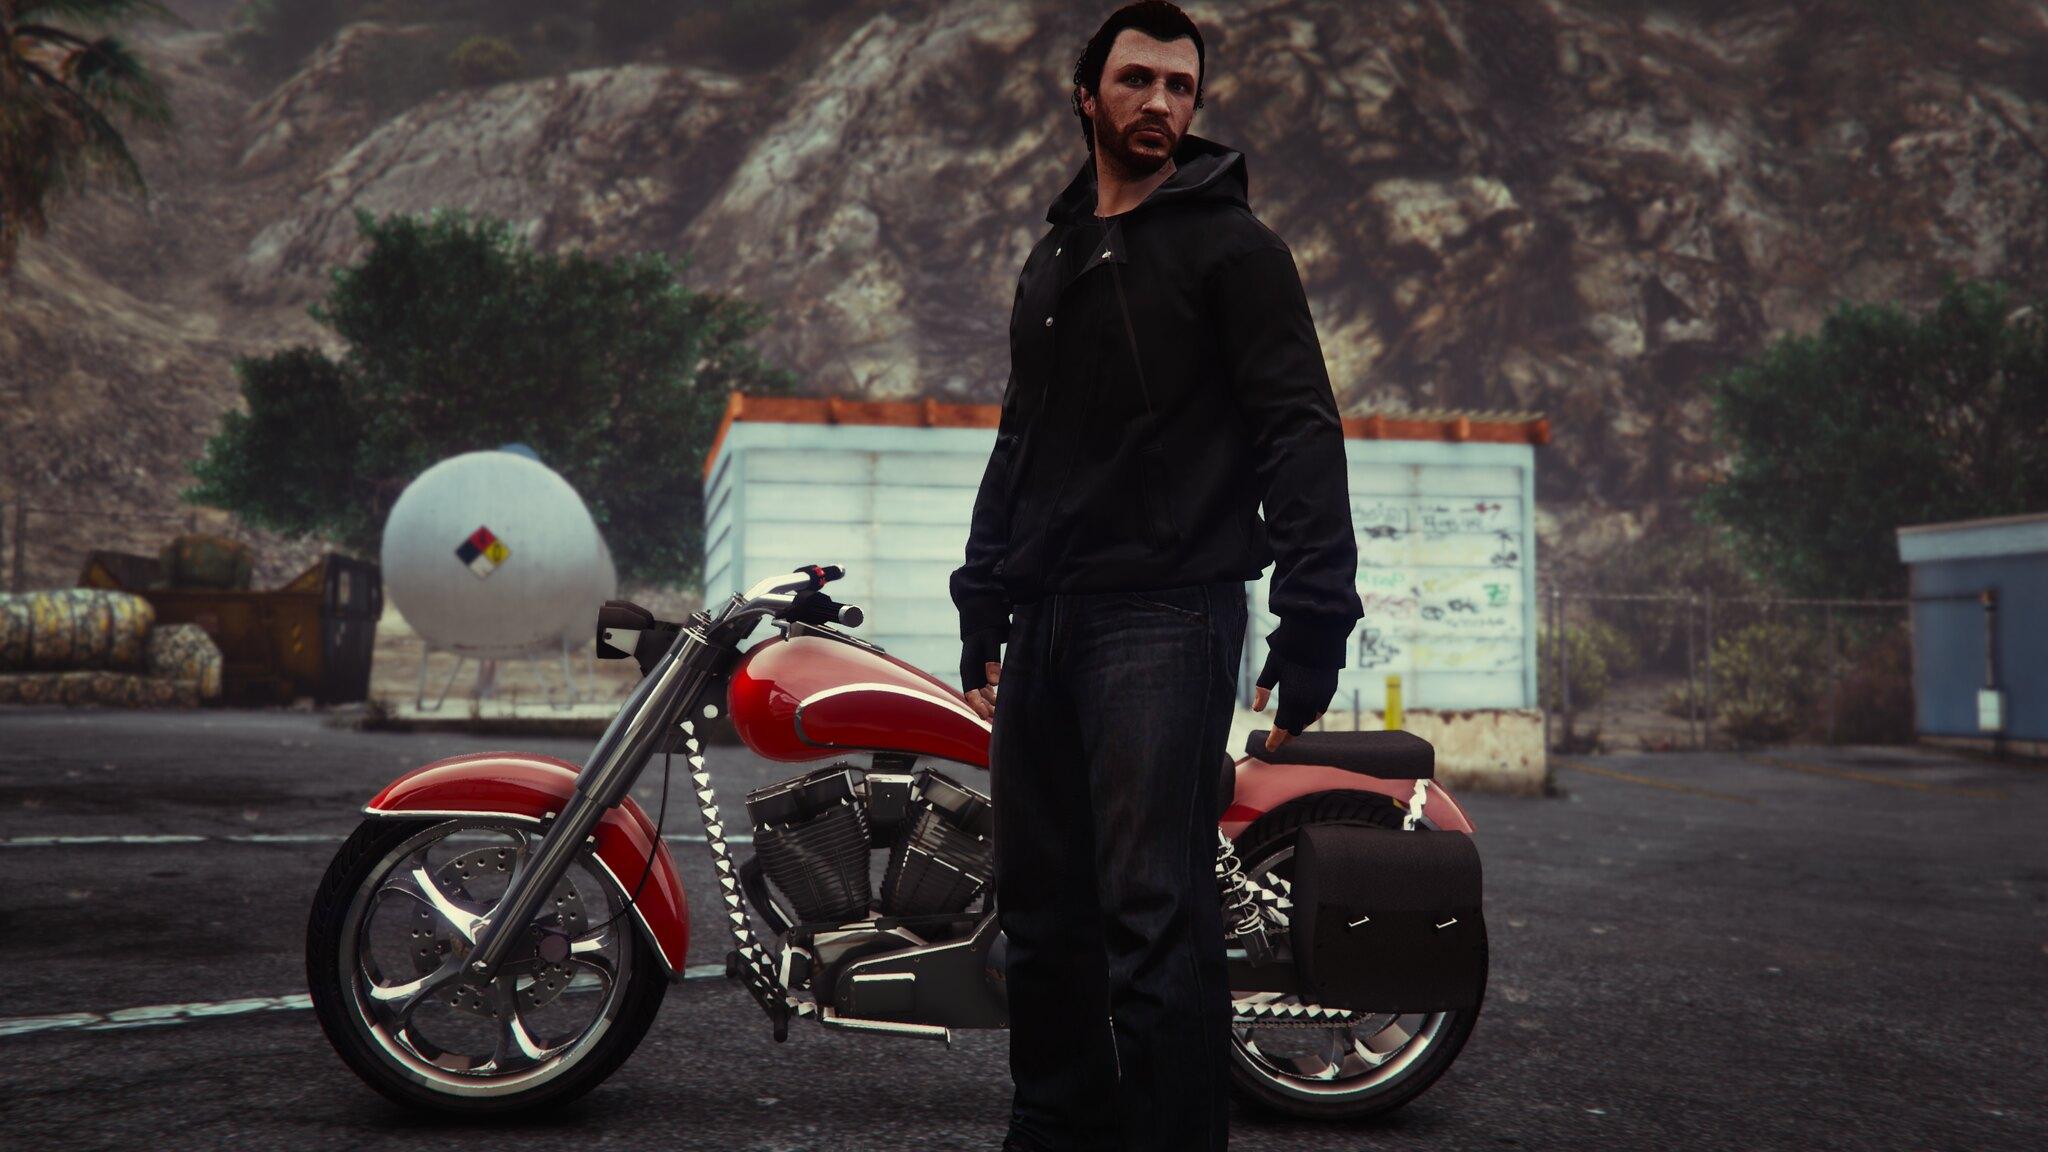 GTA V Screenshots (Official)   - Page 3 20603878138_6ace400968_k